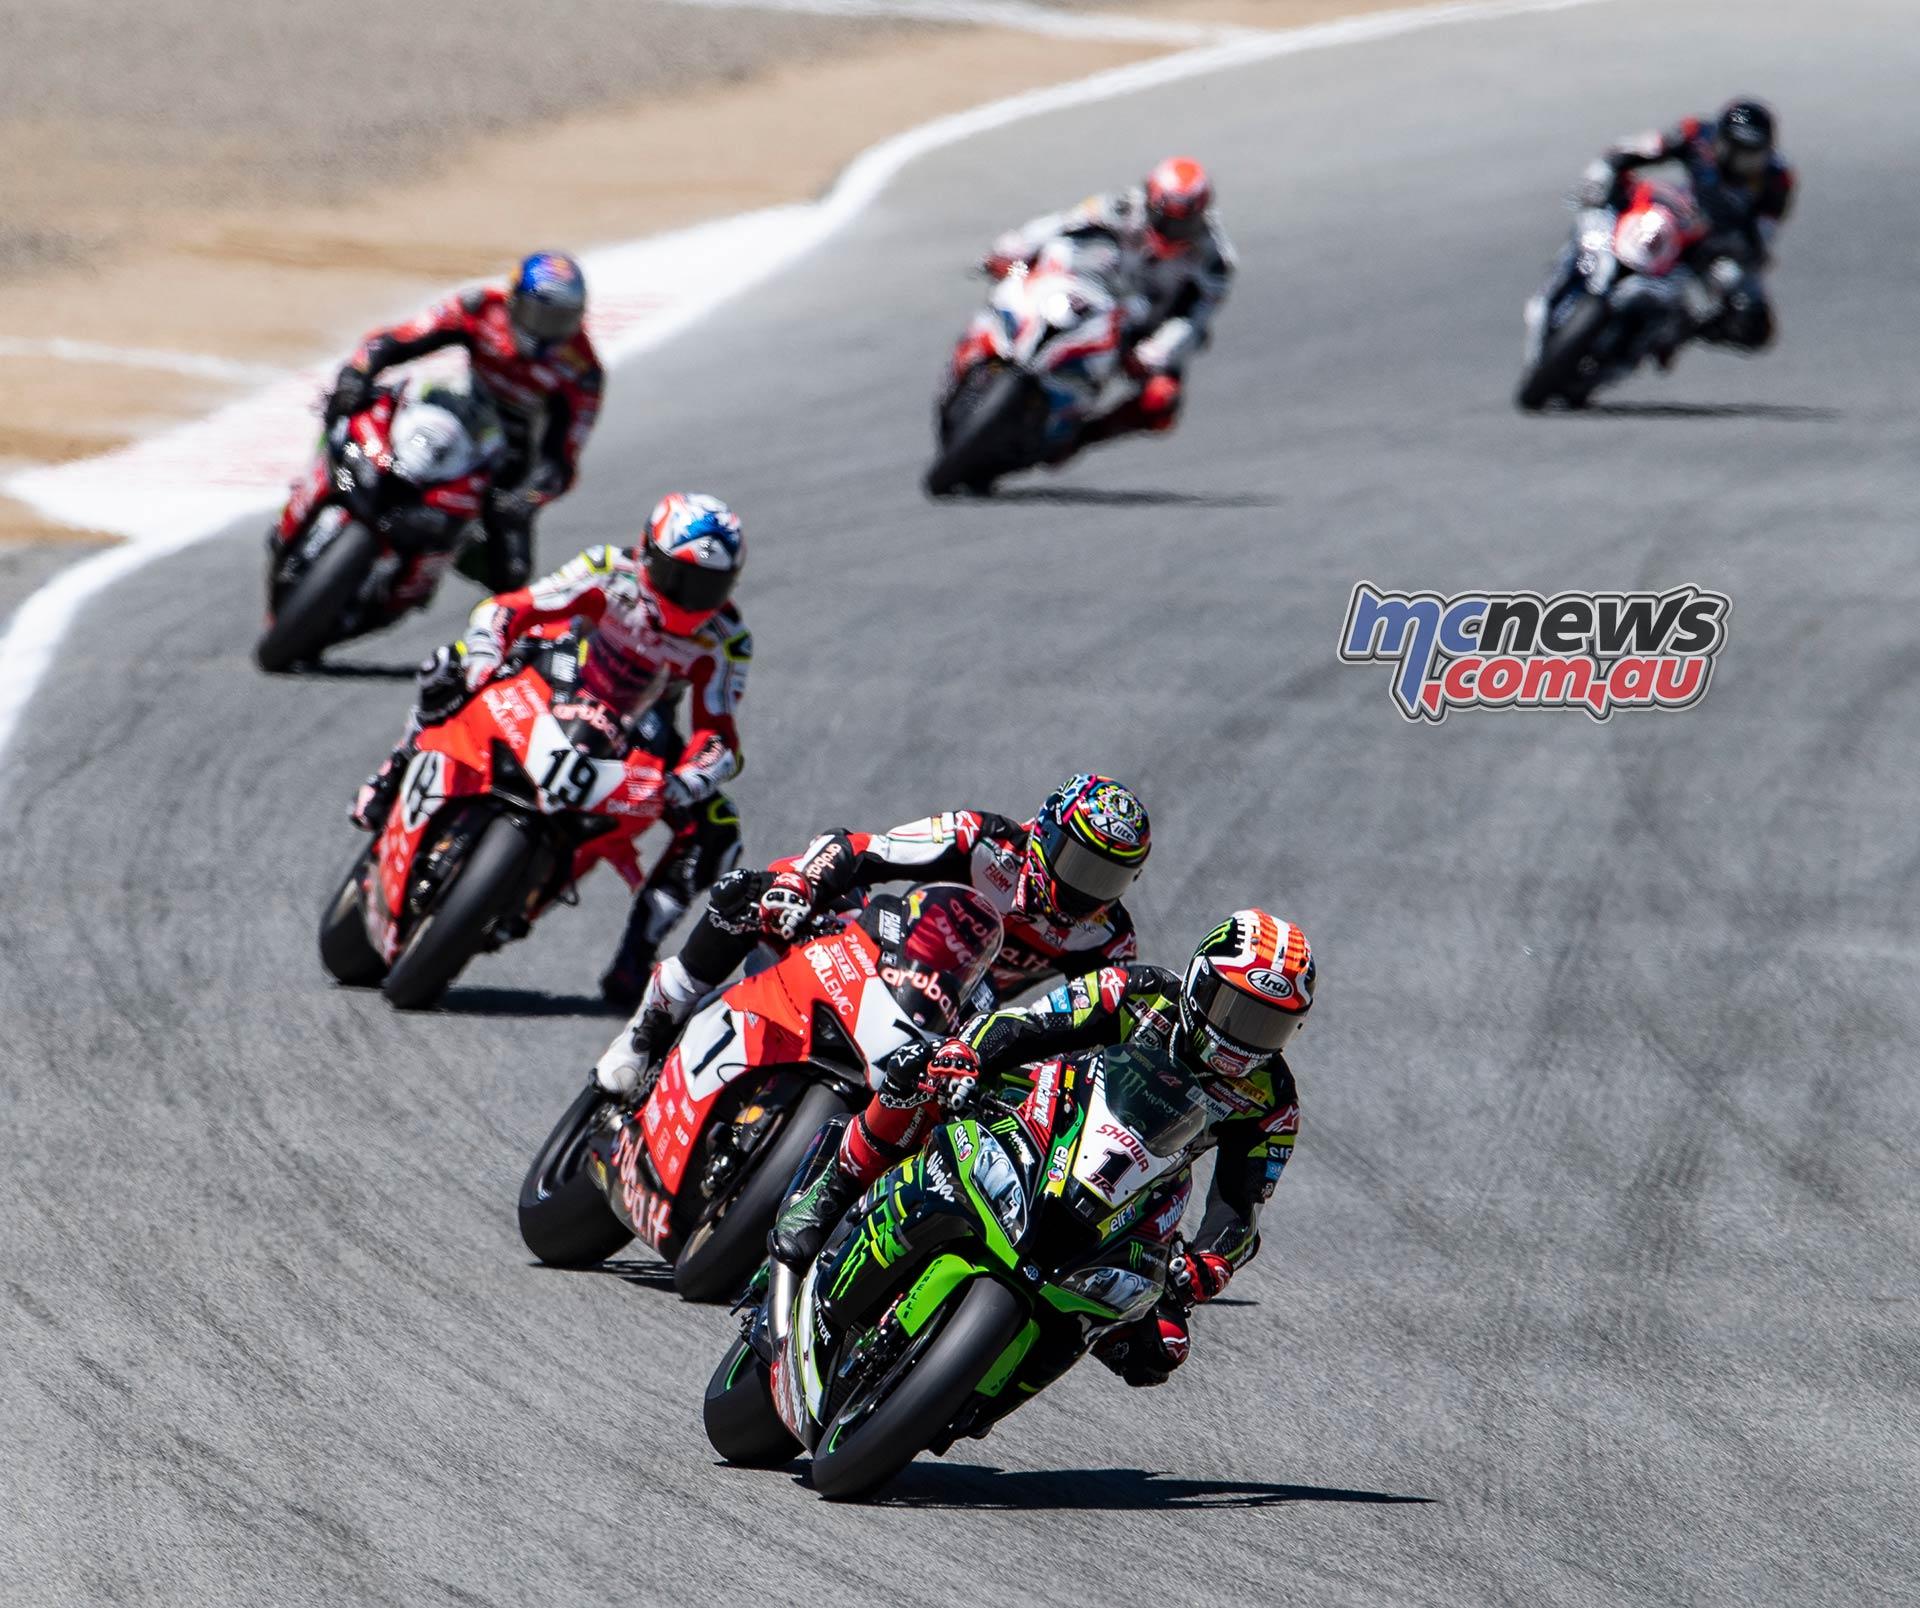 WSBK Rnd LagunaSeca Race Rea Davies Bautista